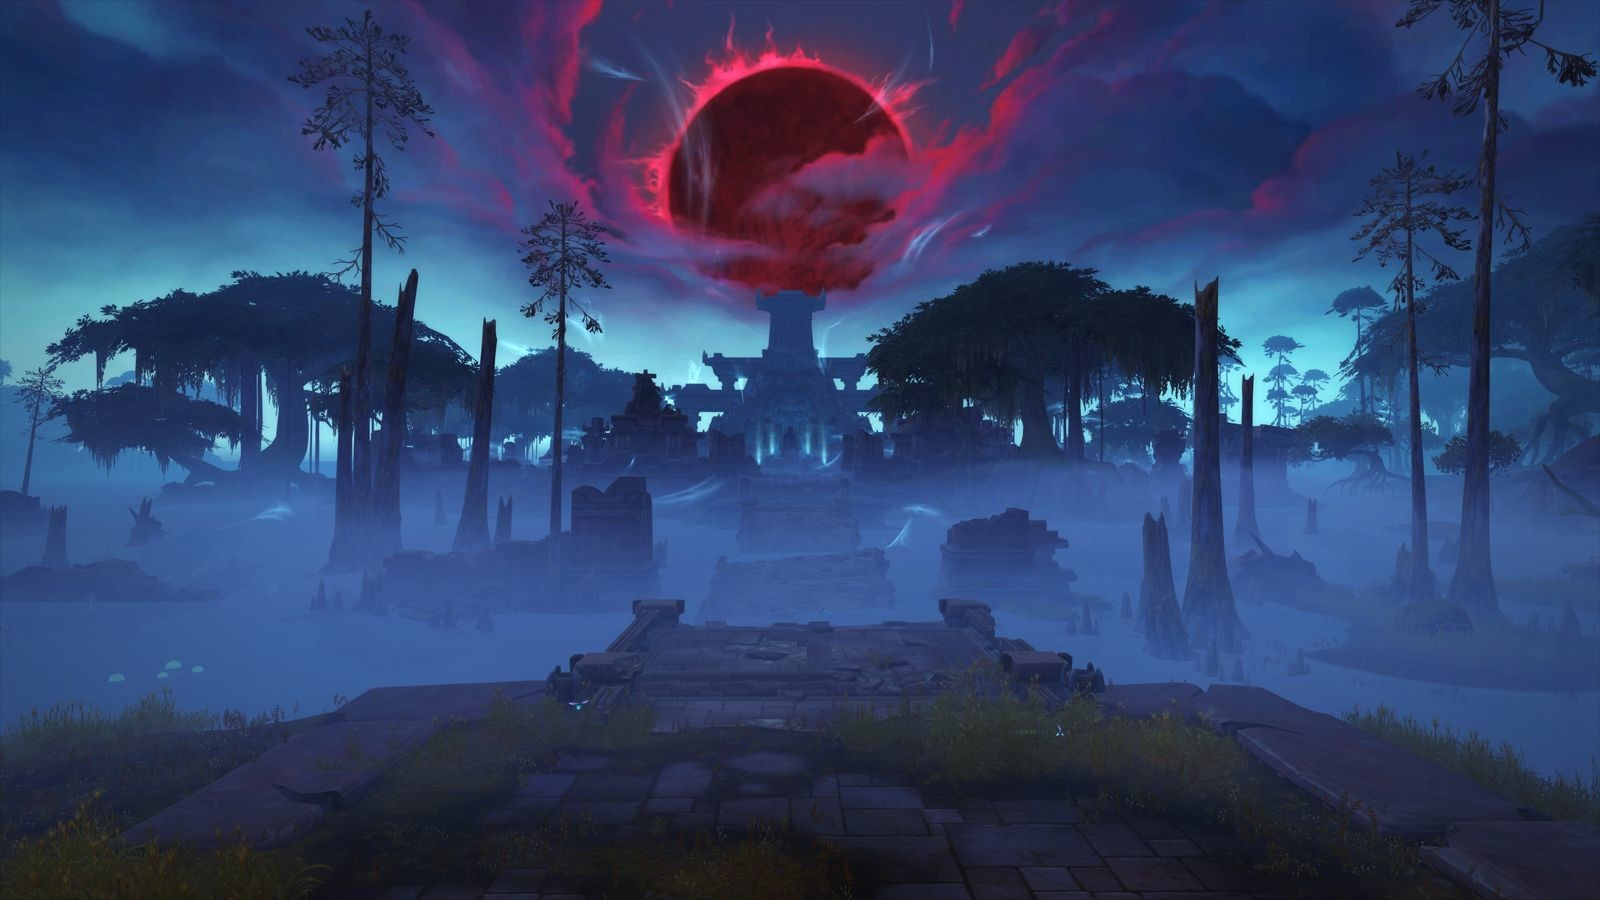 ArtStation - Blizzcon2017 BFA Announcement - Blood Moon